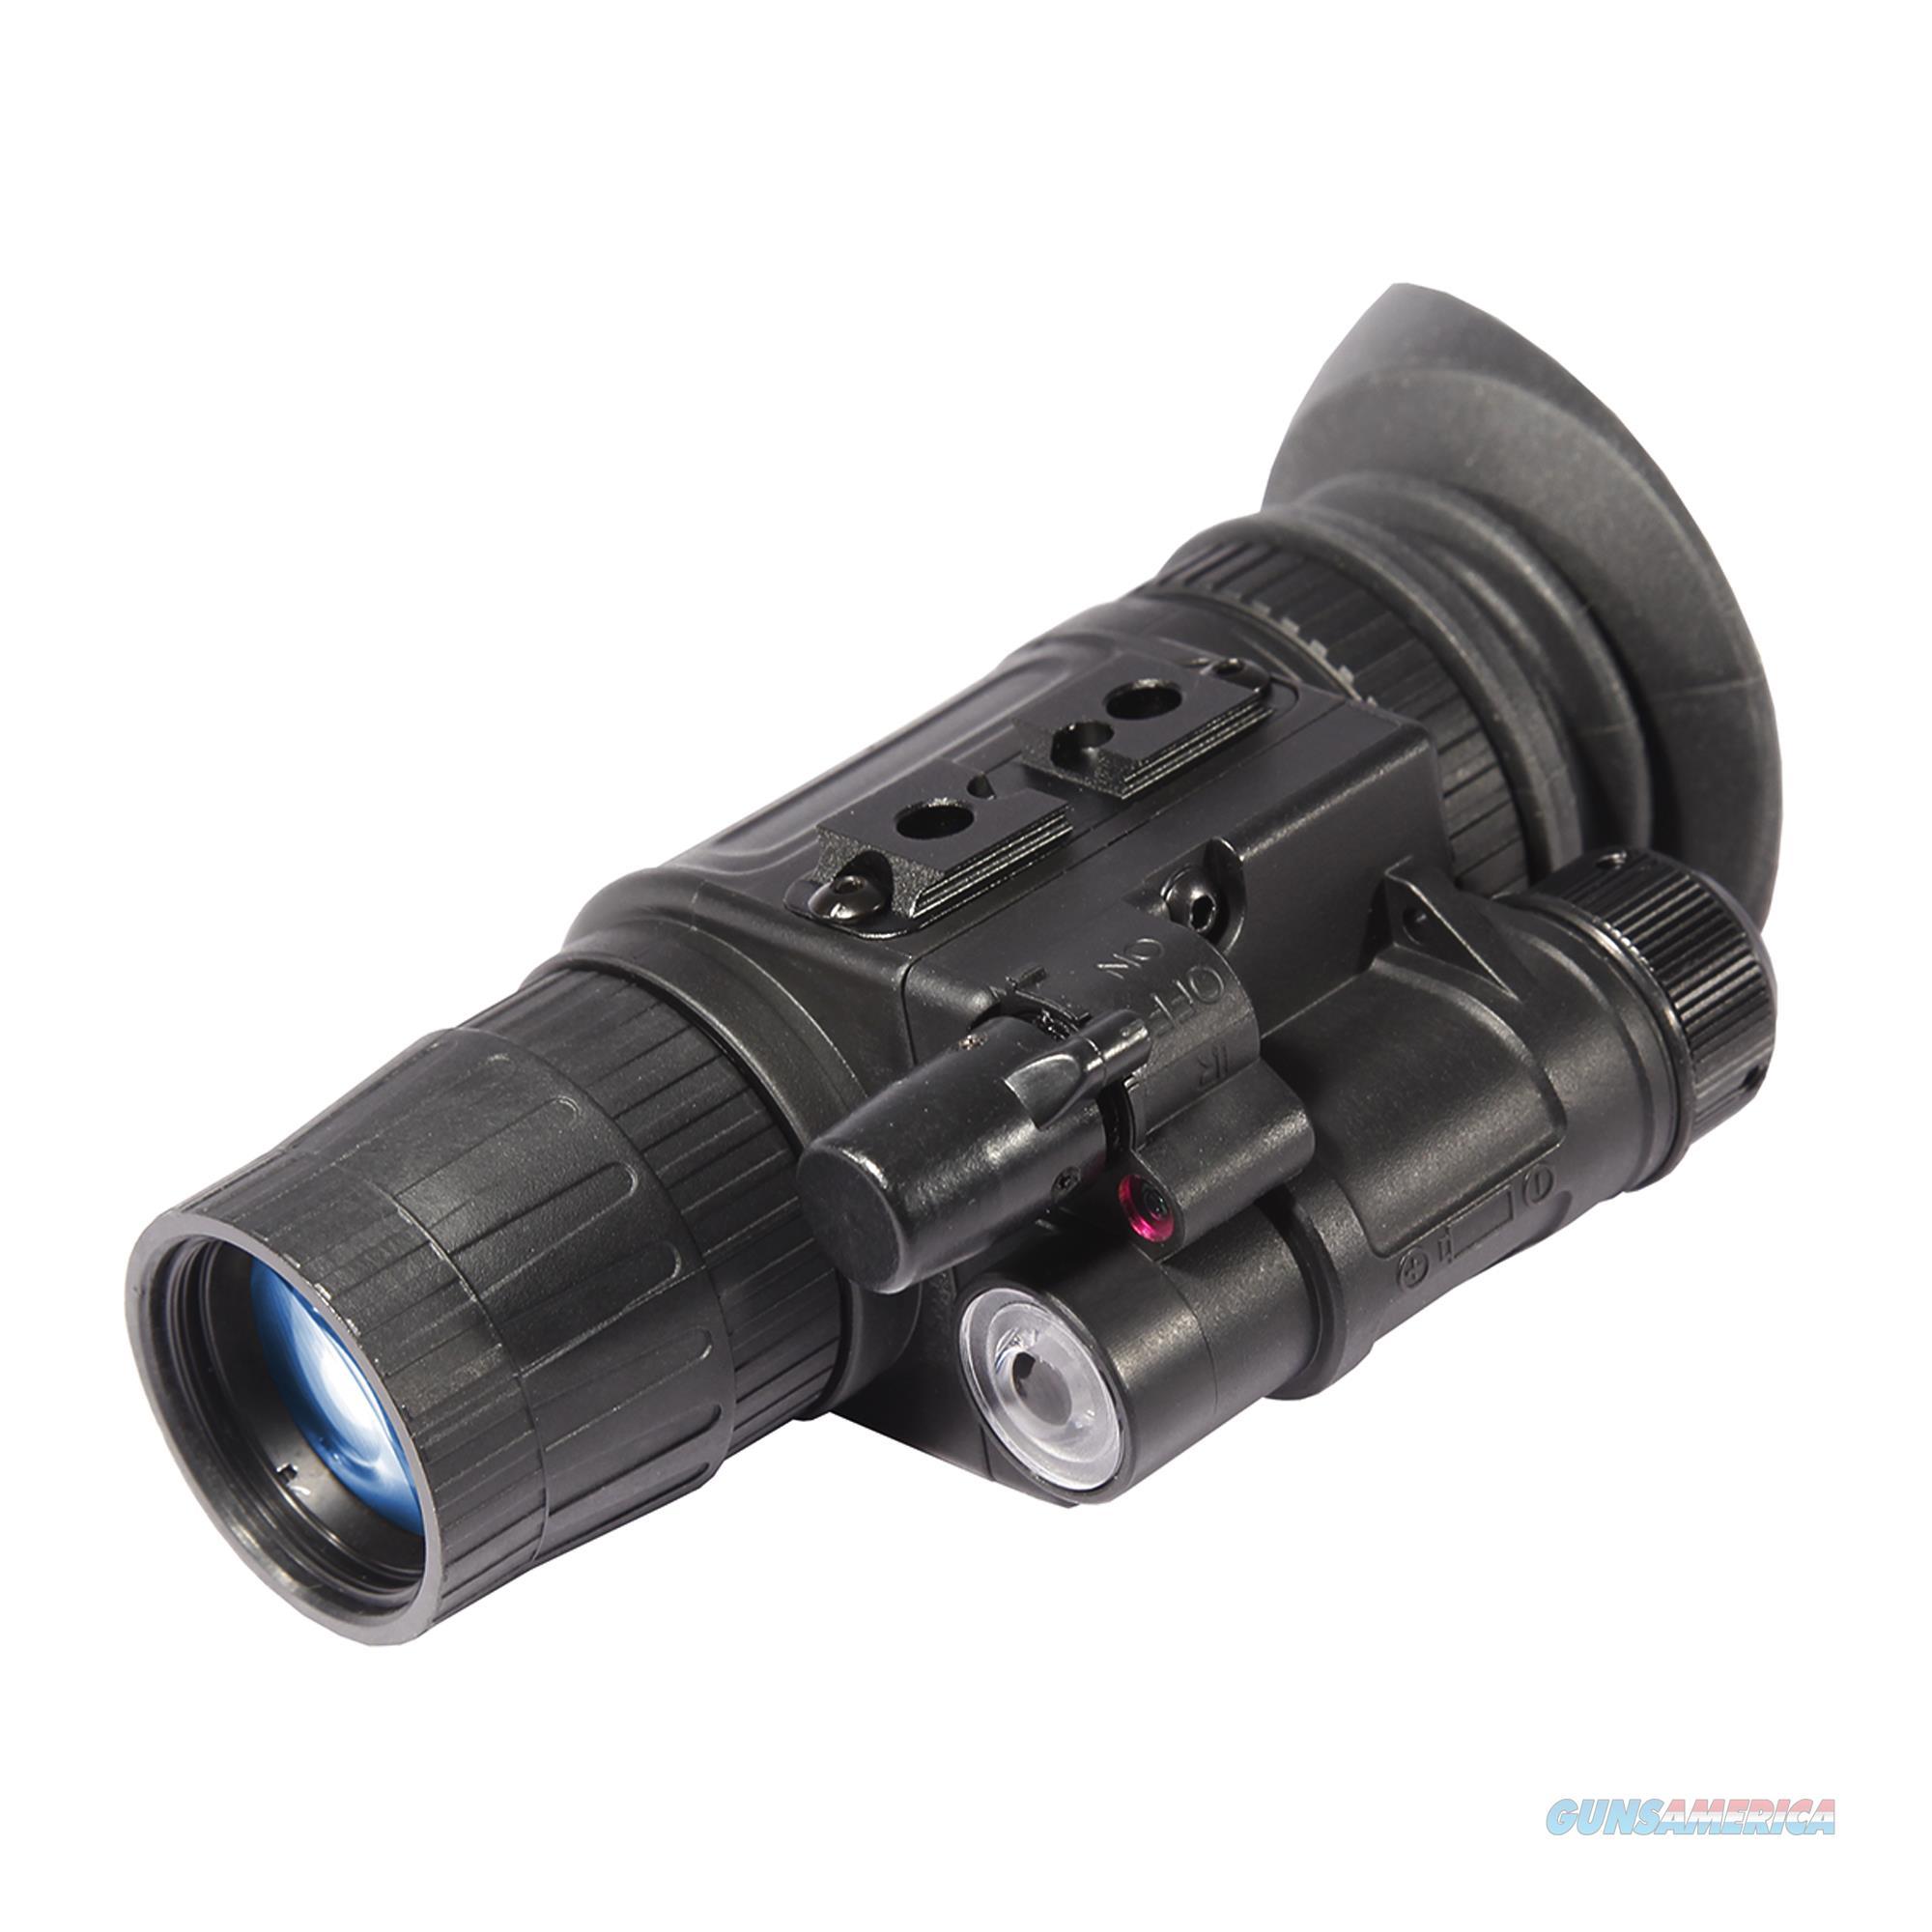 Atn Nvm14 Multi Purpose NVMPAN1440  Non-Guns > Night Vision